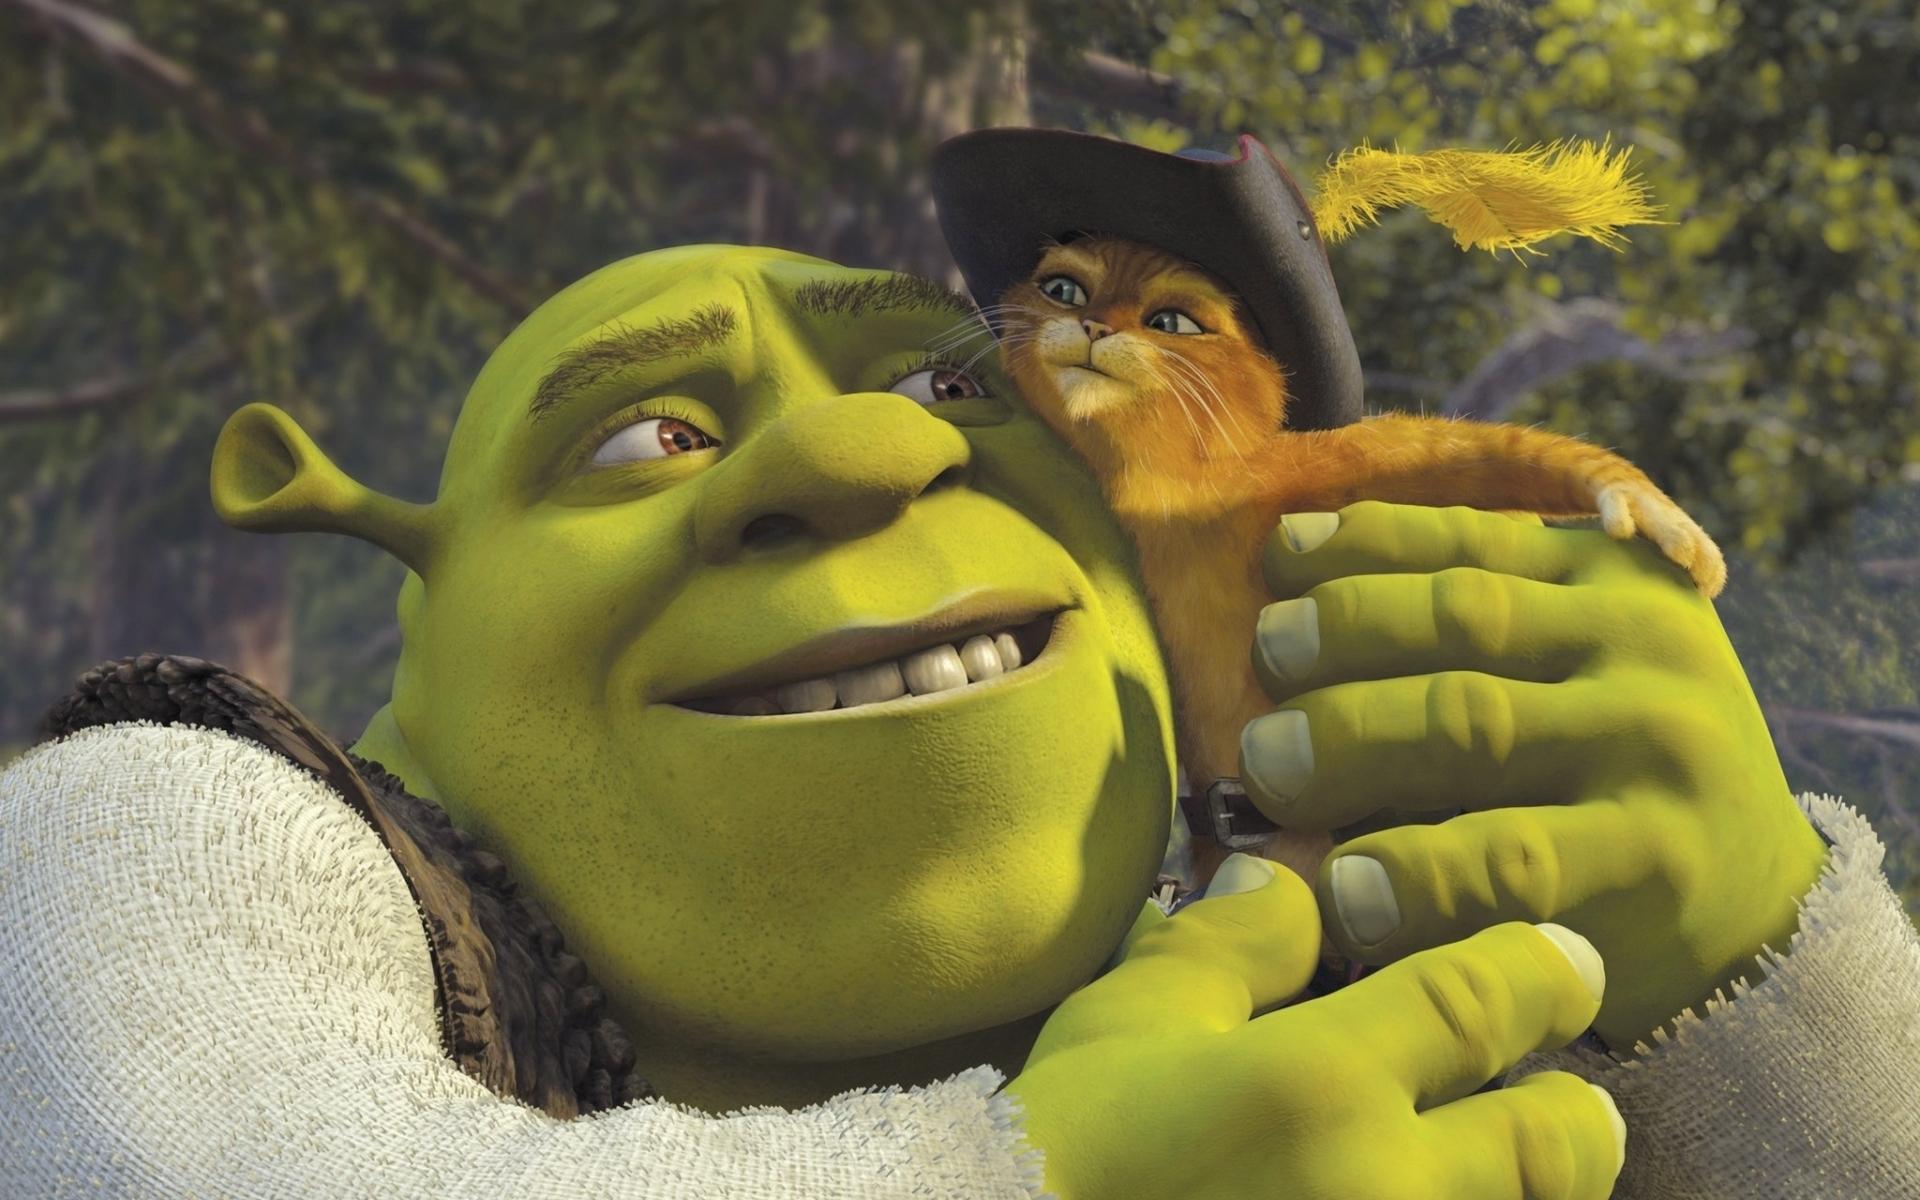 Shrek 2 Full HD Wallpaper and Background Image | 1920x1200 ...